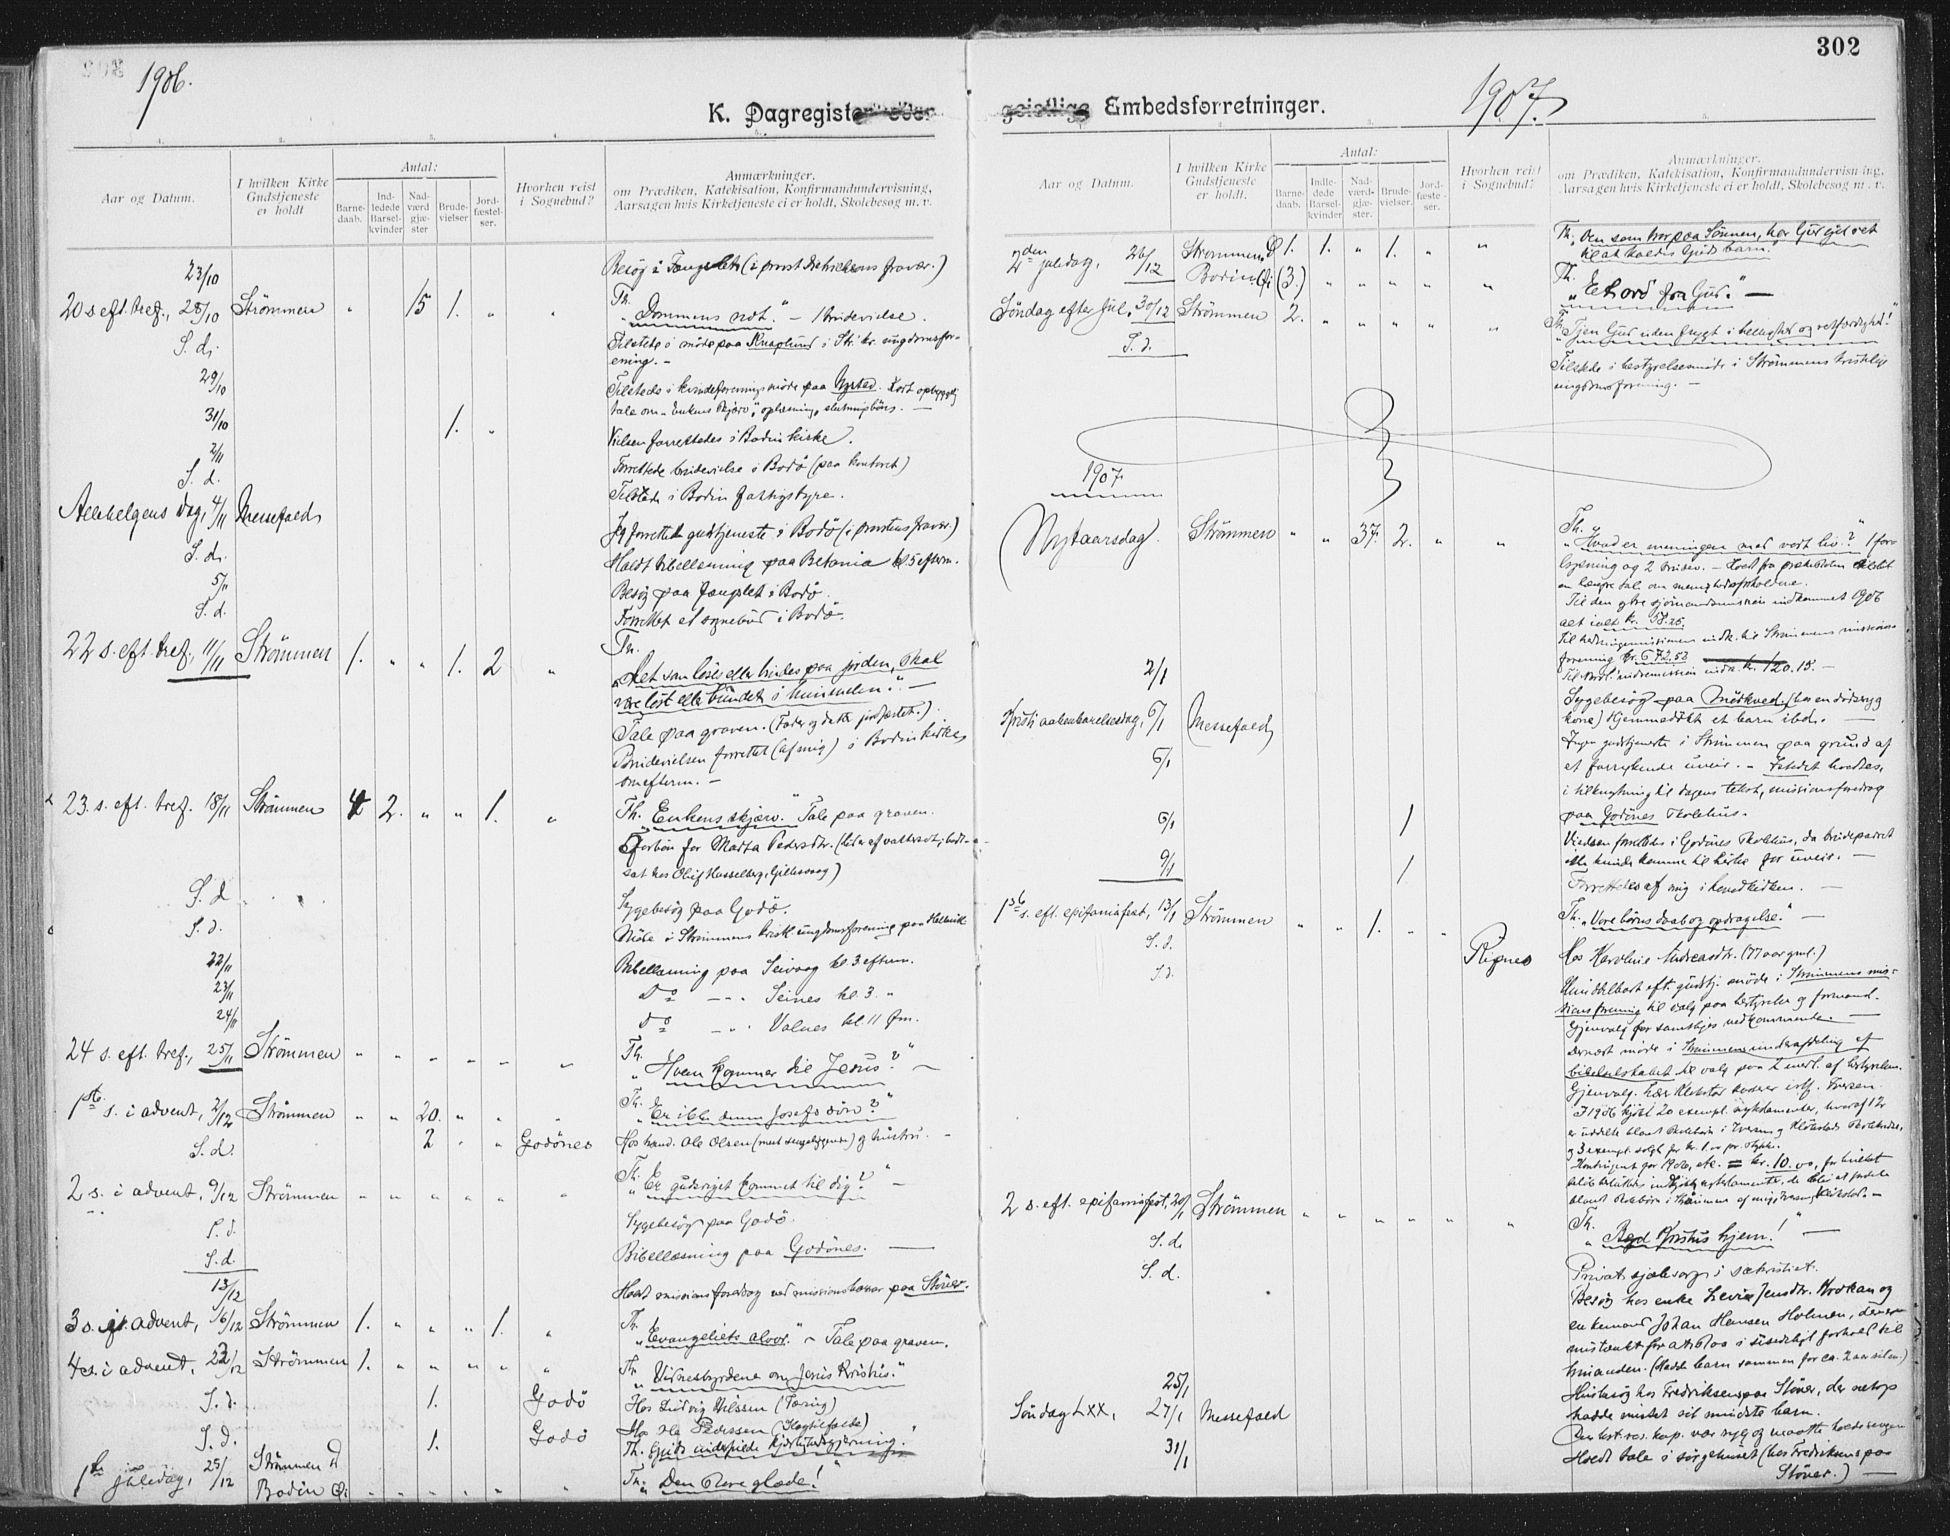 SAT, Ministerialprotokoller, klokkerbøker og fødselsregistre - Nordland, 804/L0081: Ministerialbok nr. 804A02, 1901-1915, s. 302